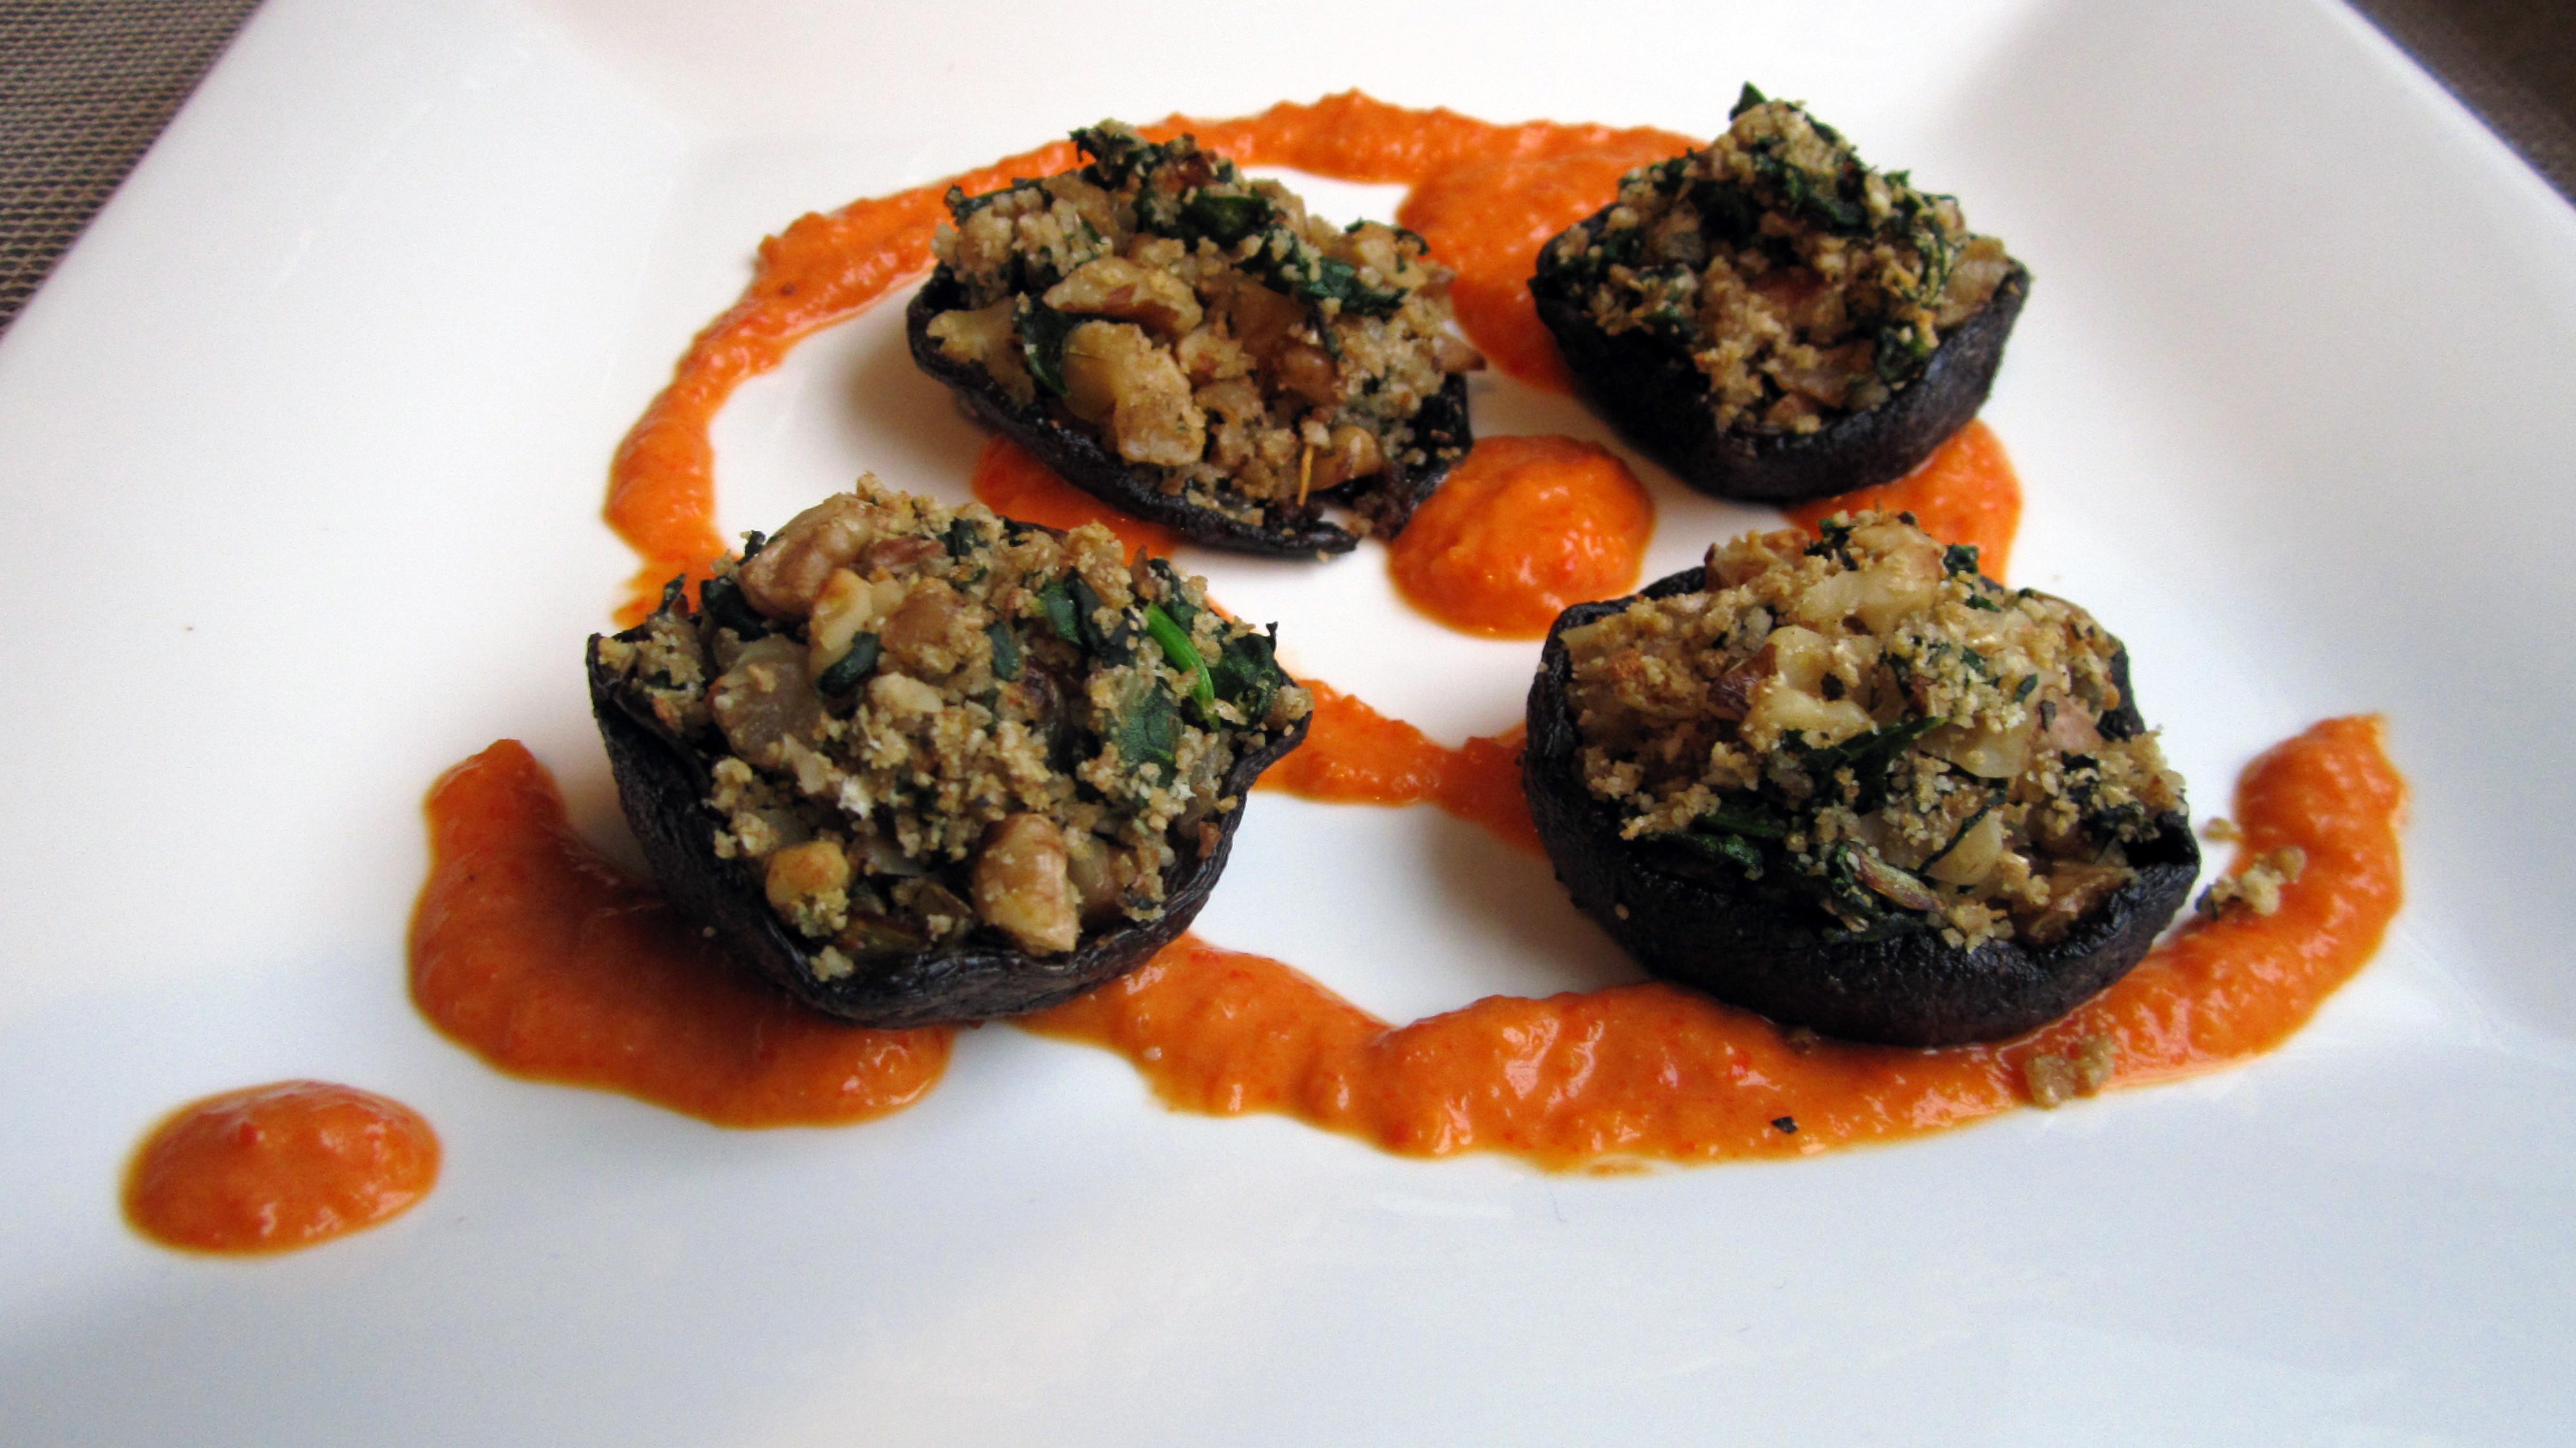 Vegan Portobello Mushroom Recipes  Stuffed Portobello Mushrooms W Roasted Red Pepper Coulis